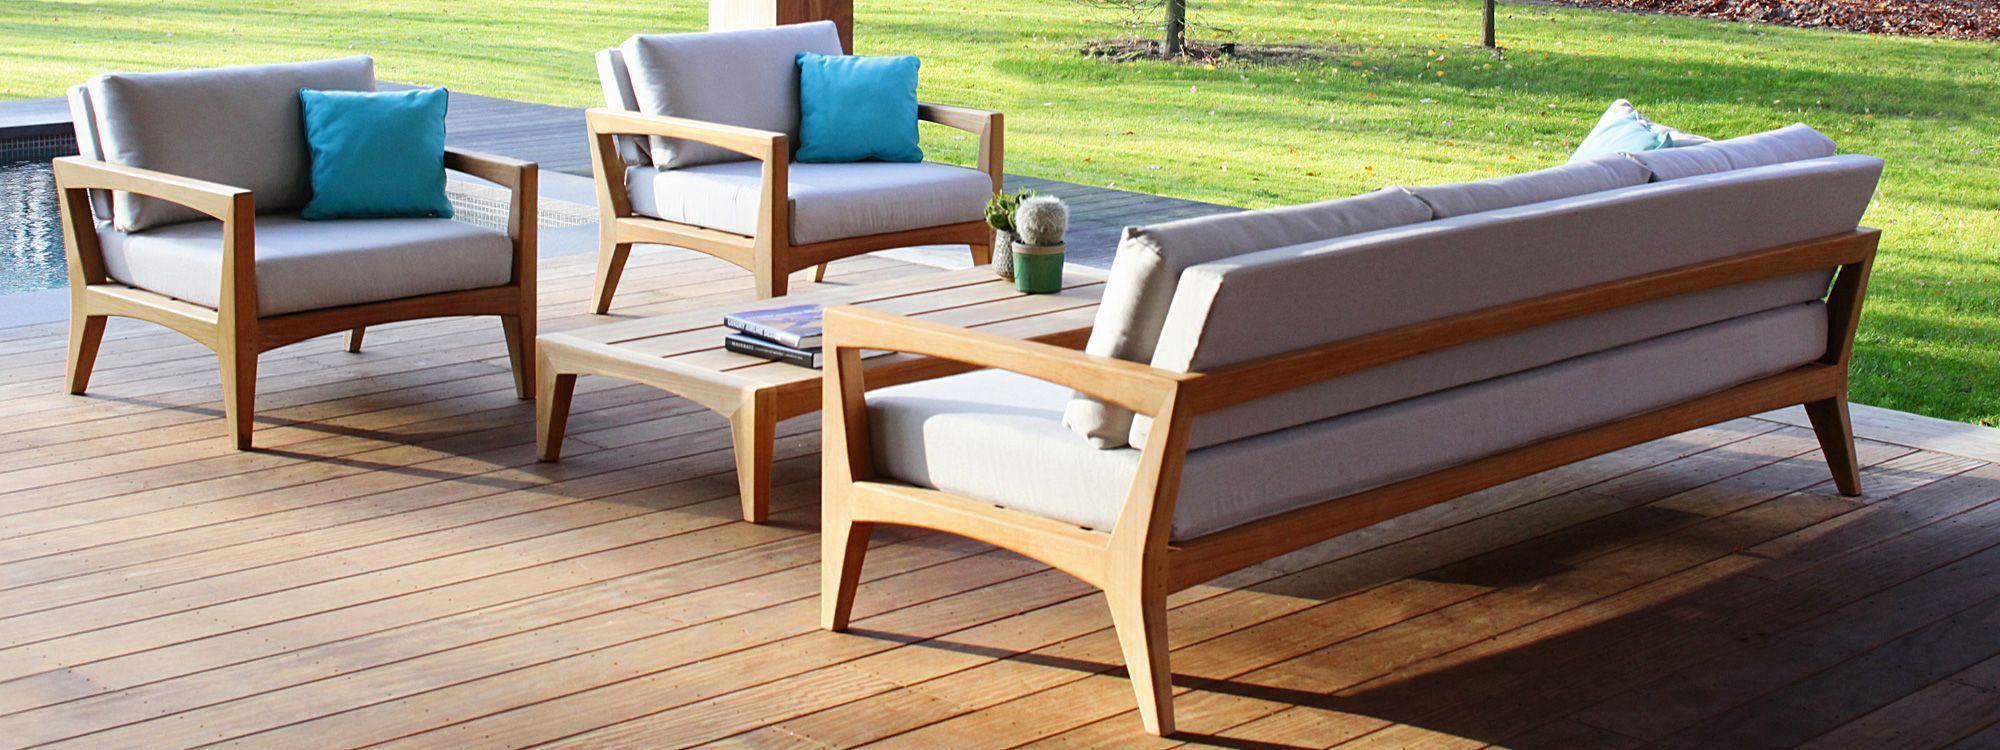 Teak Stain For Garden Furniture